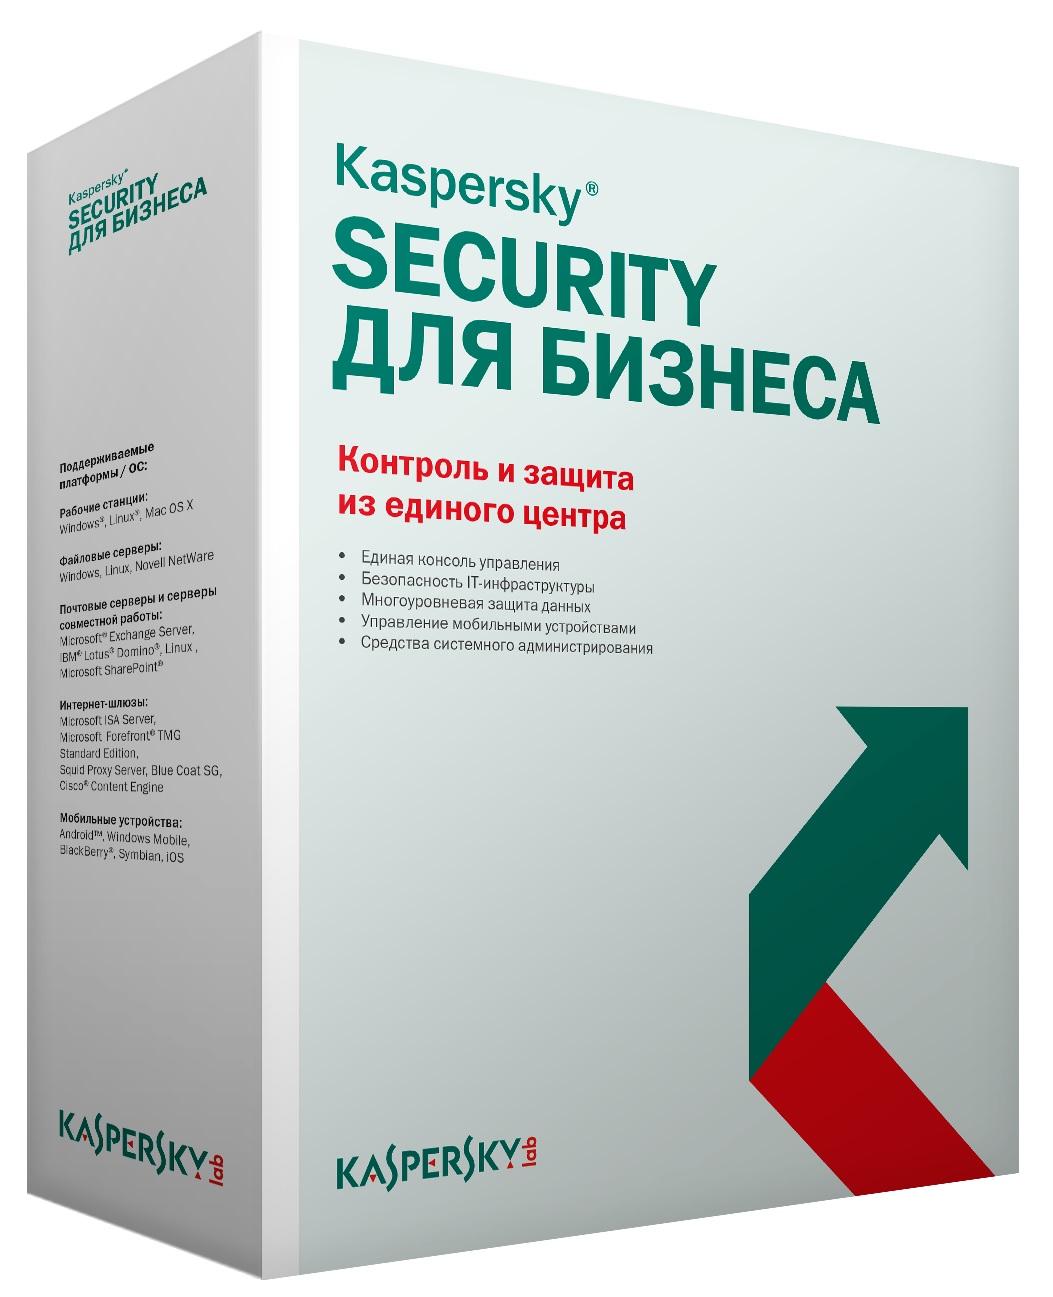 Kaspersky russian radio - 6b